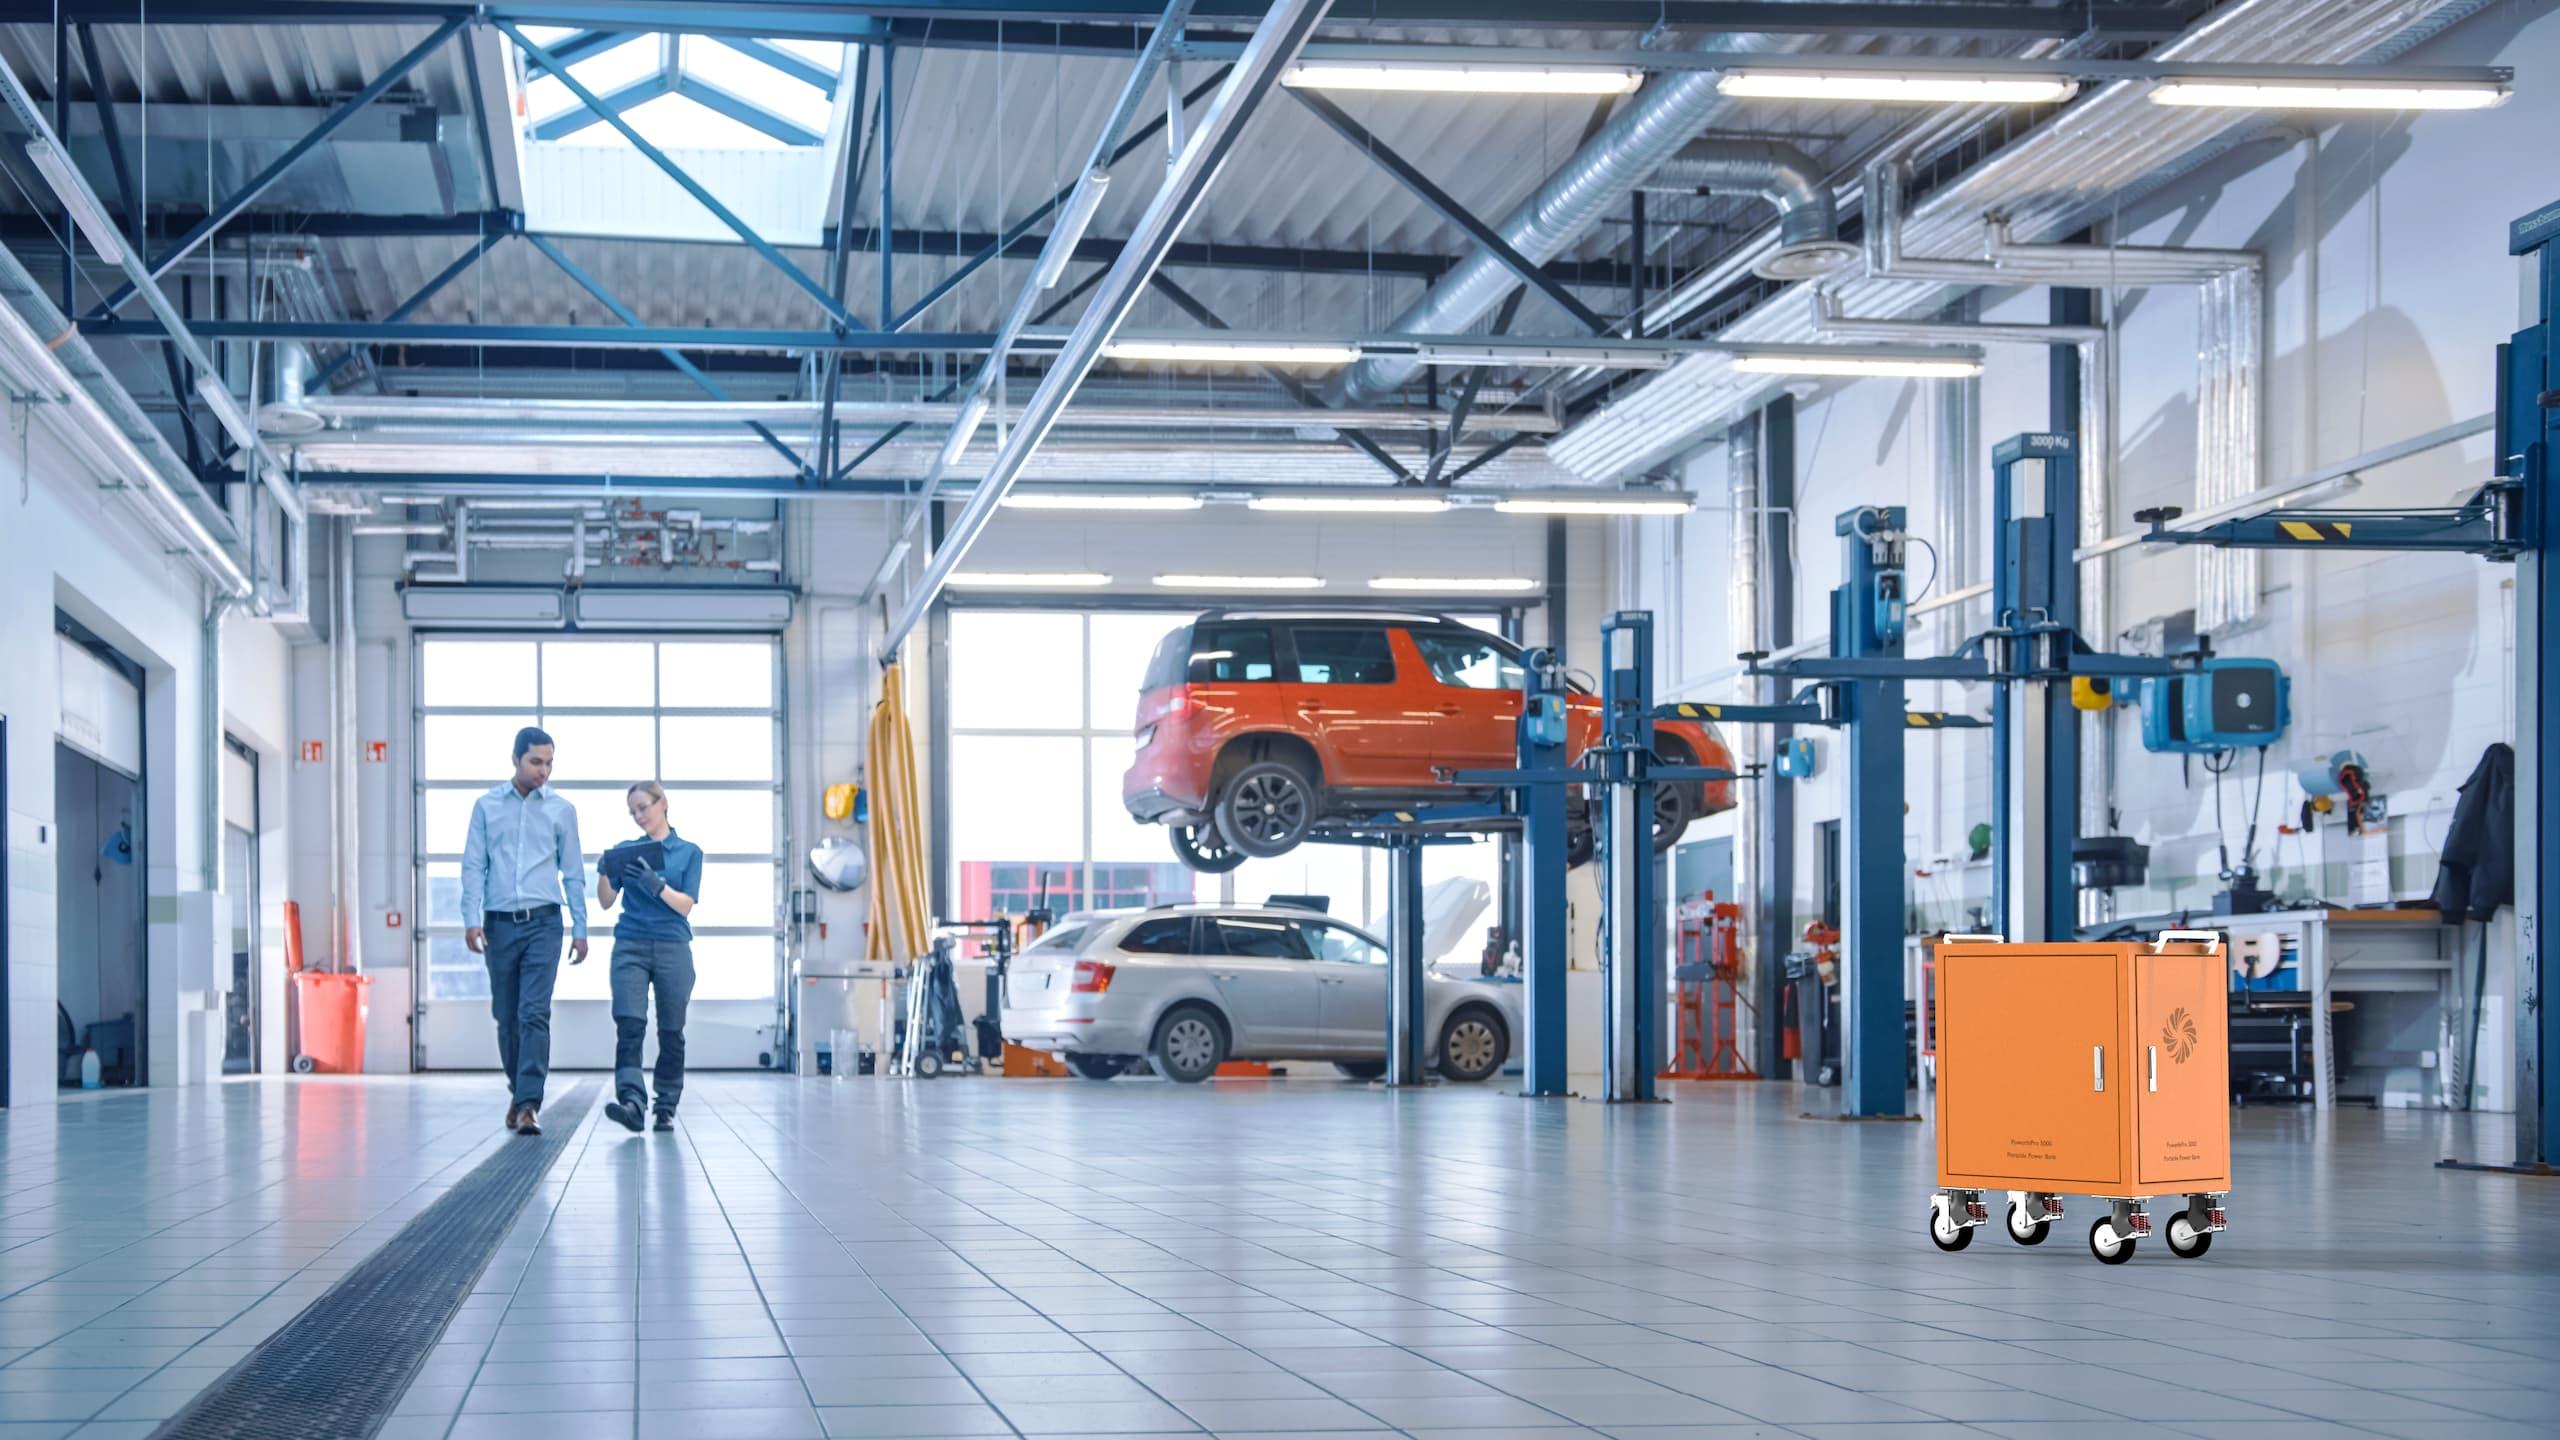 portable-power-bank-application-in-car-repair-workshop